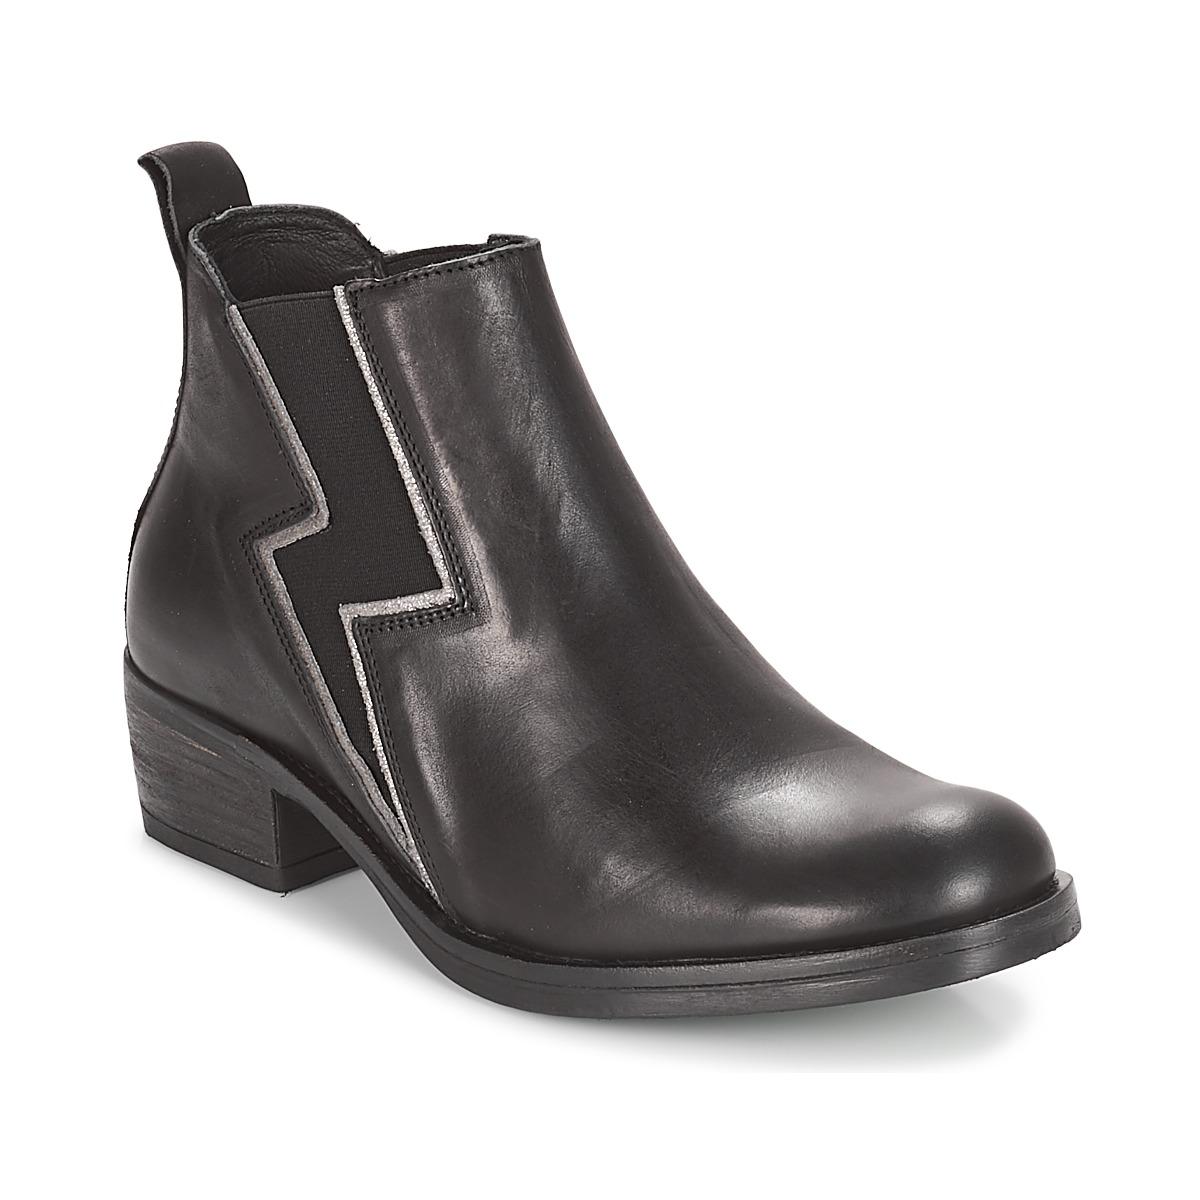 Støvler PLDM by Palladium  RIEMA CMR